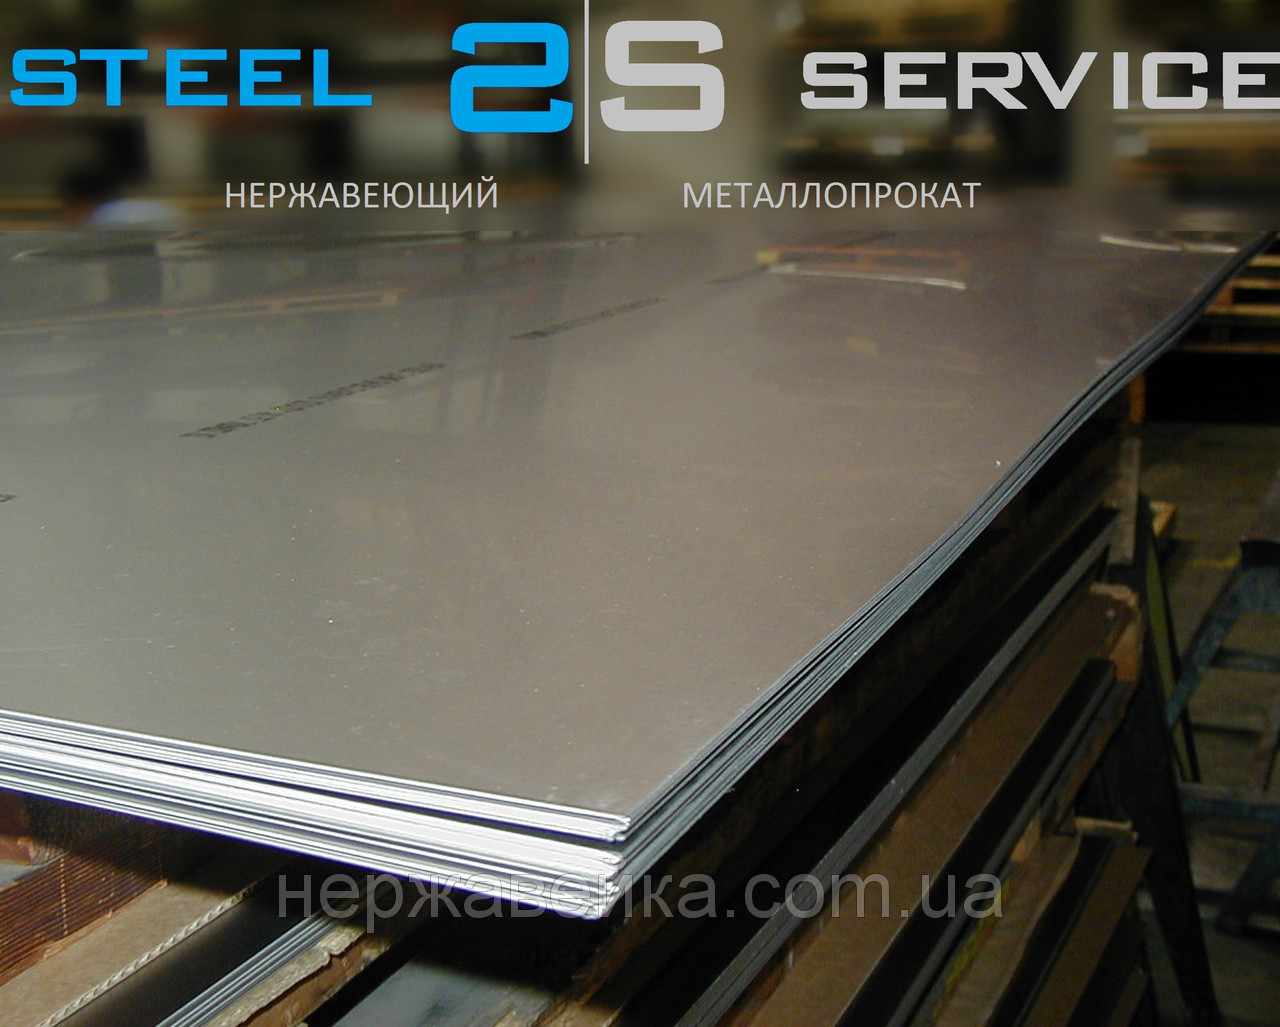 Нержавейка лист 5х1250х2500мм  AISI 316L(03Х17Н14М3) F1 - горячекатанный,  кислотостойкий